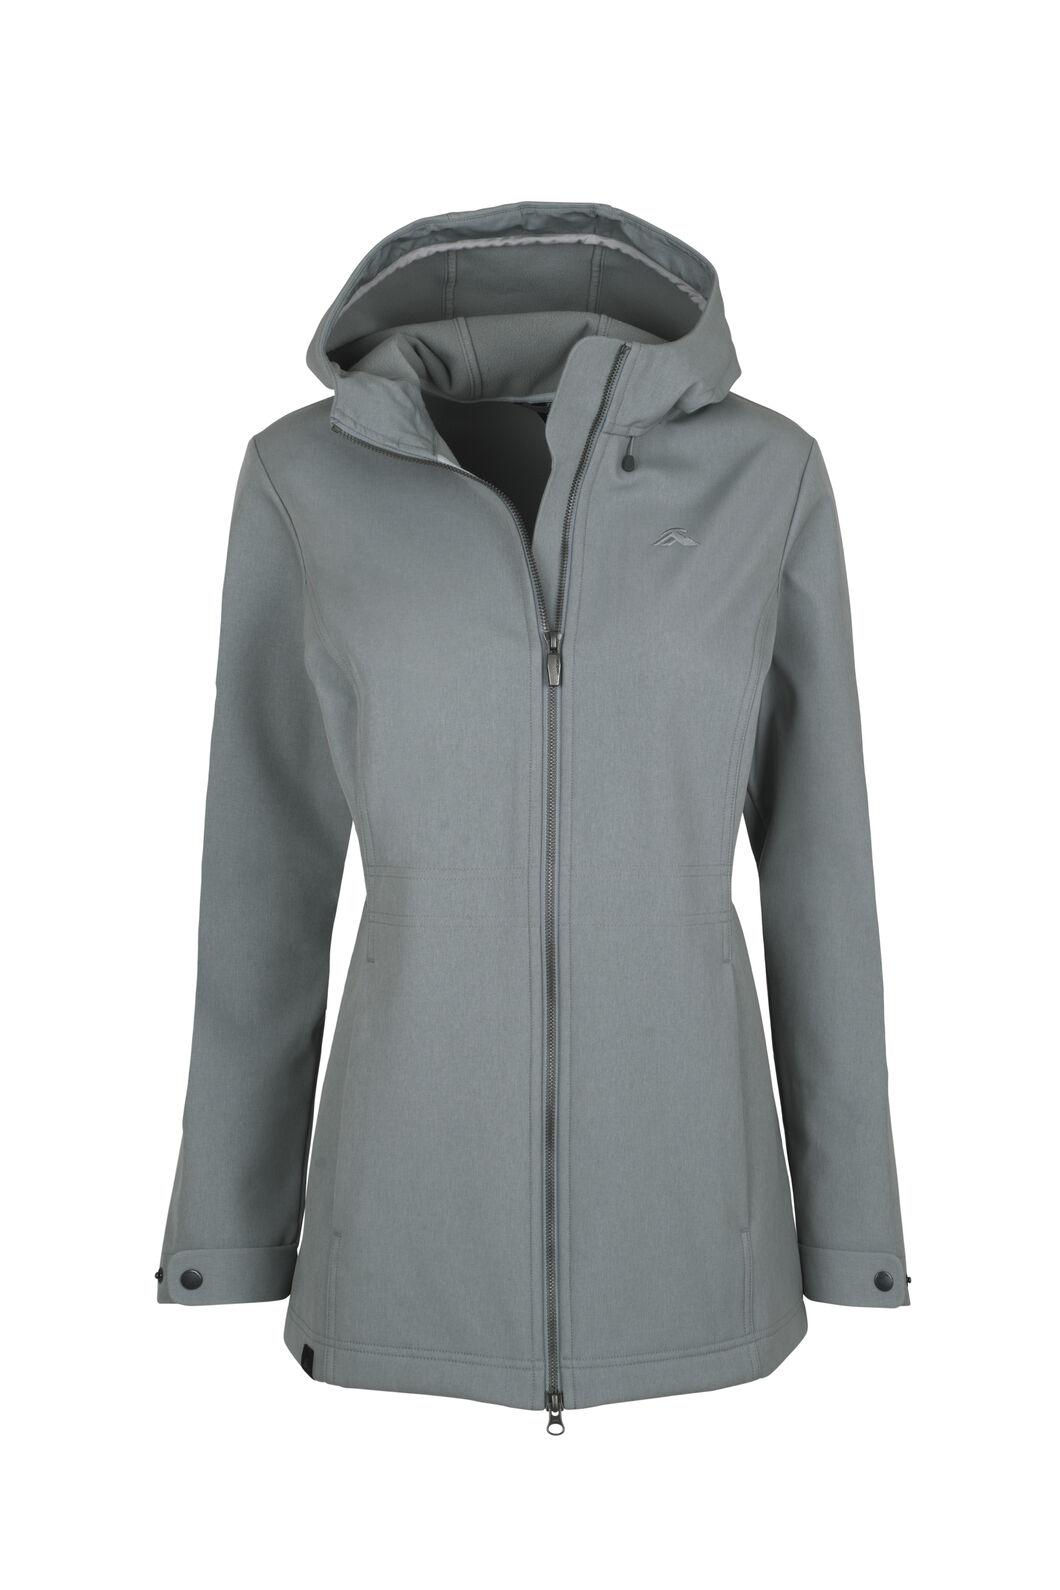 Macpac Chord Softshell Jacket - Women's, Monument, hi-res